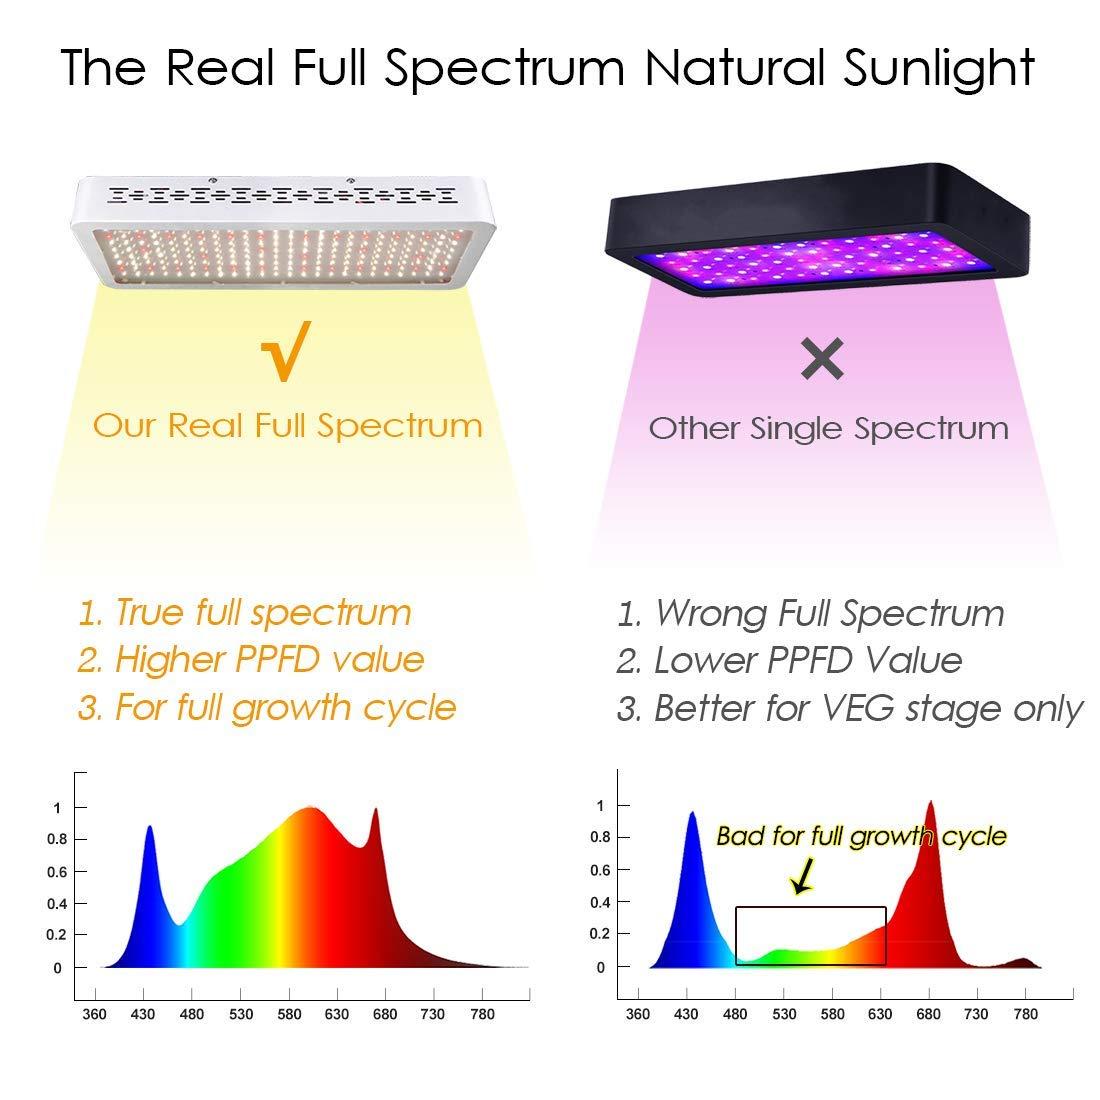 ONEO Led Grow Light 1000W Full Spectrum Sunlight 3500K White and 660nm Red  Added Grow Lights for Indoor Plants, Better for Full Growth Flowering